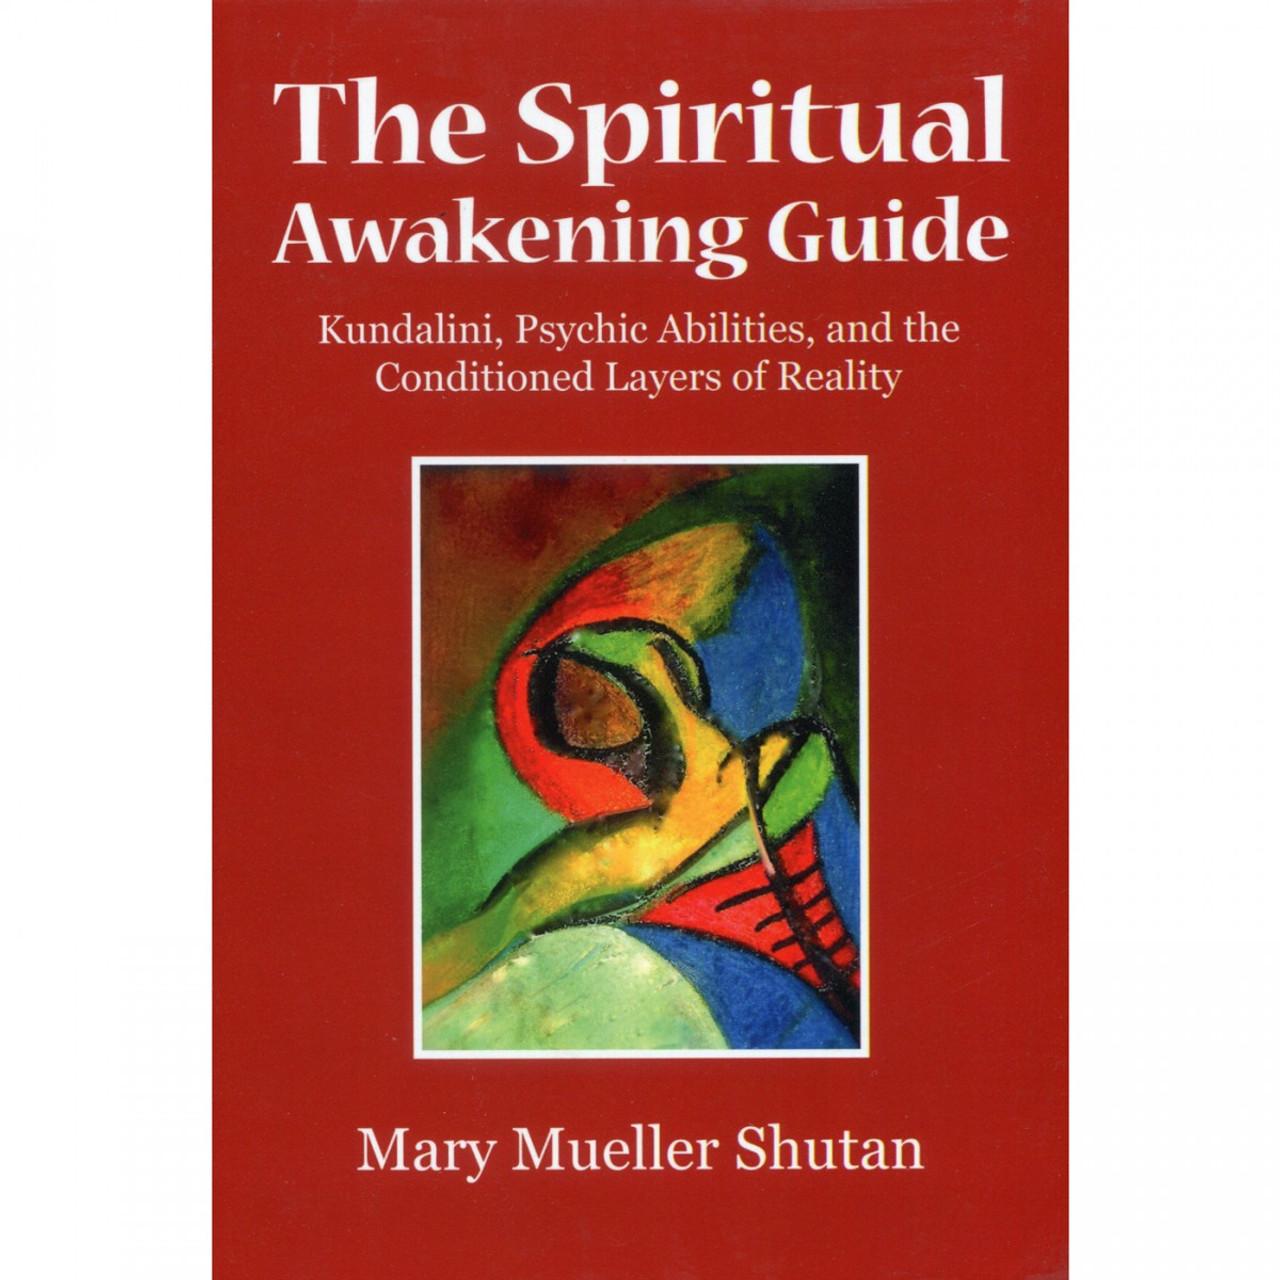 The Spiritual Awakening Guide by Mary Mueller Shutan